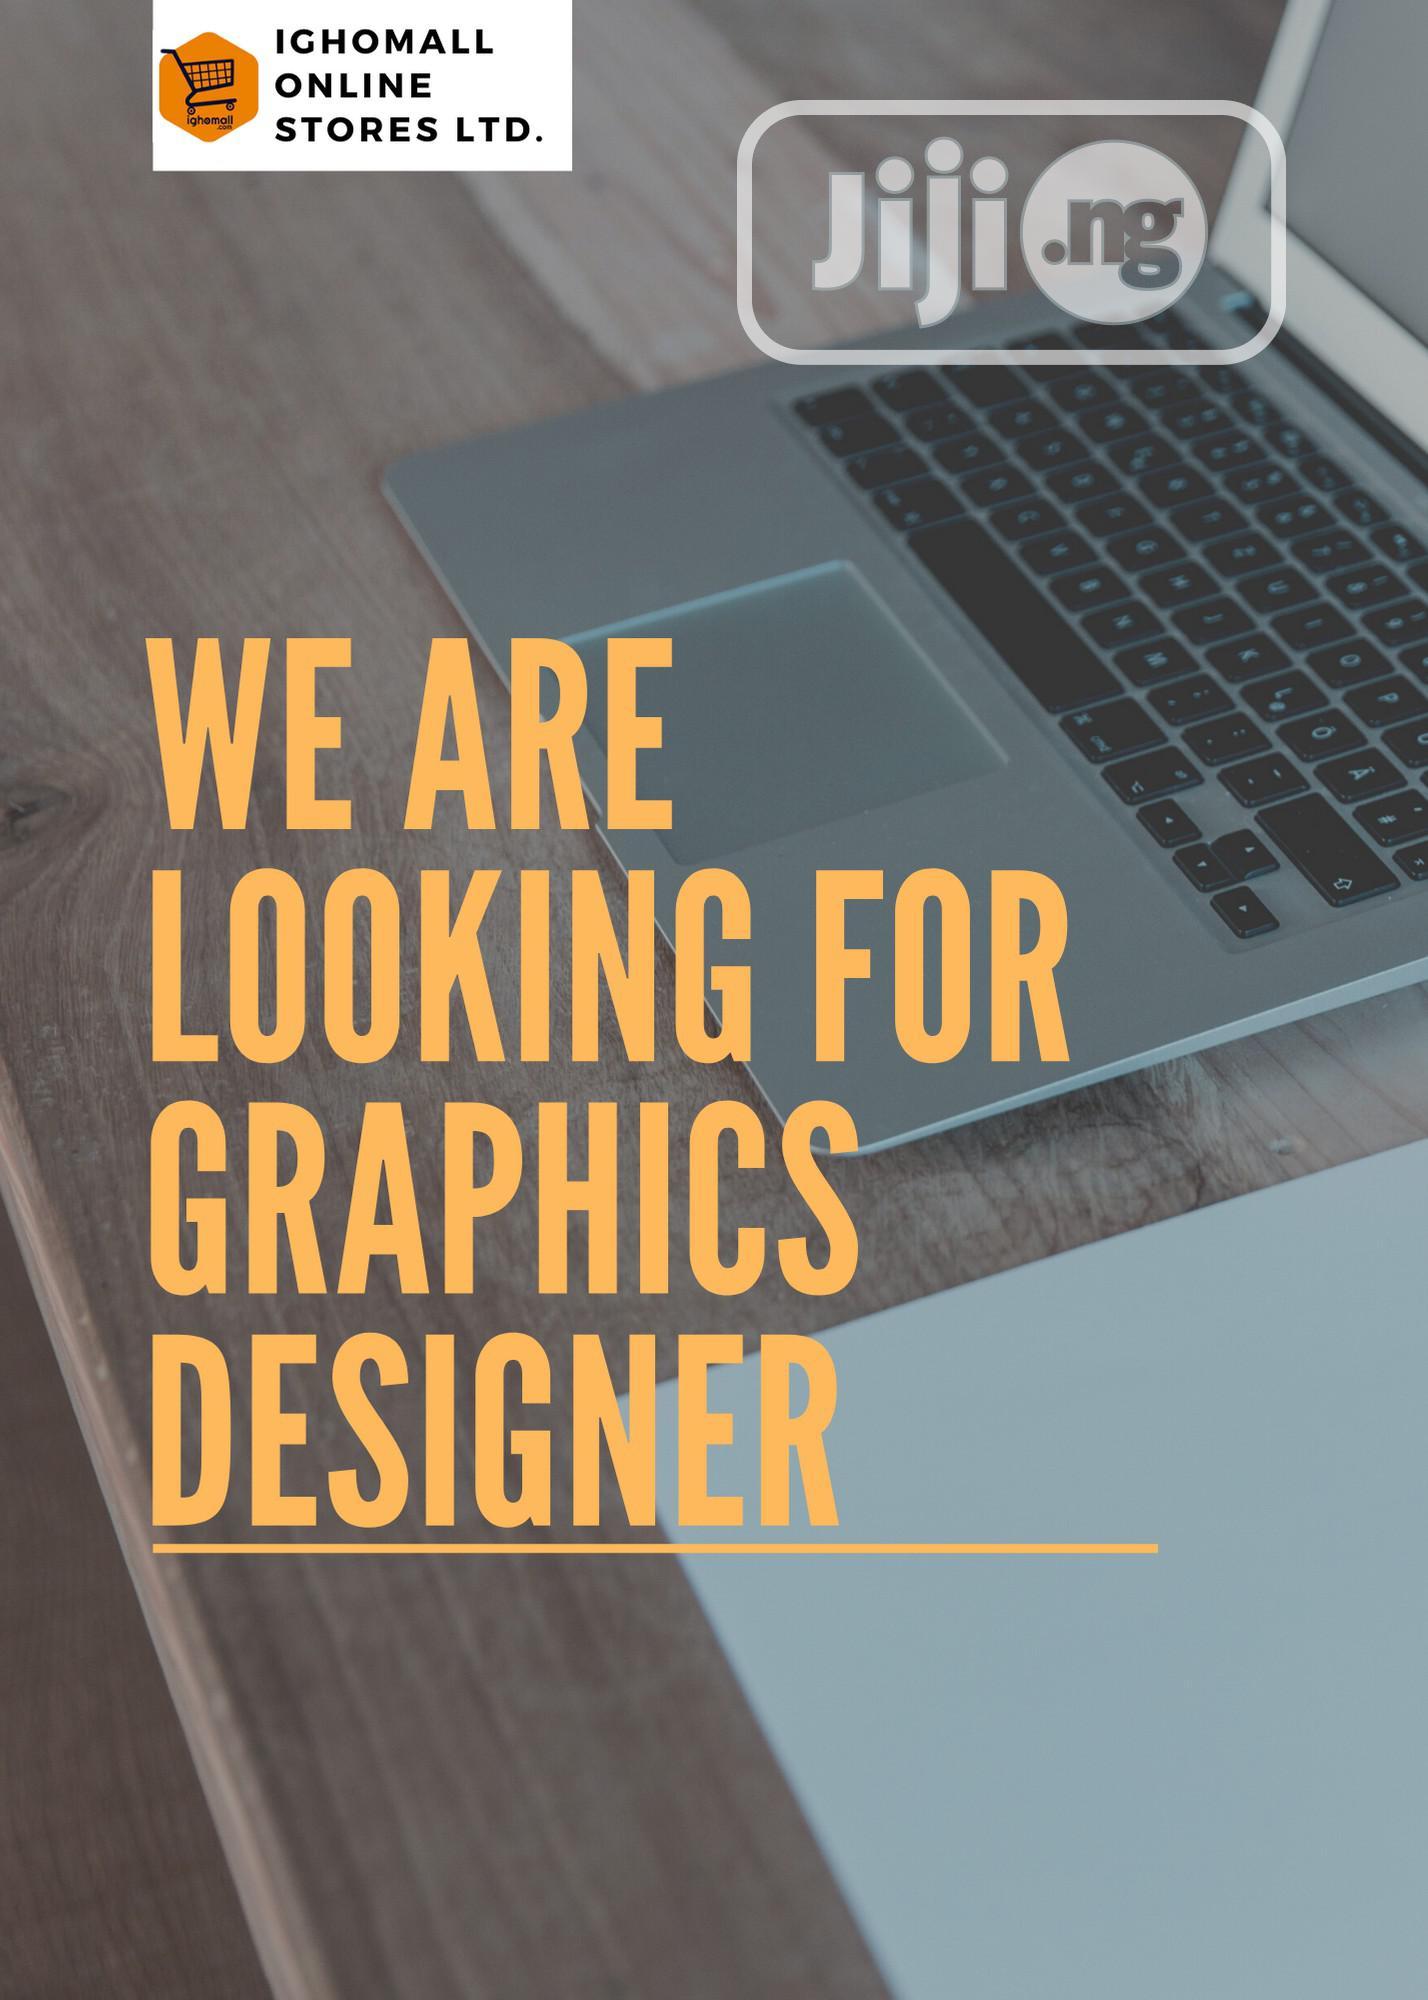 Archive: Experienced Graphics Designer Needed